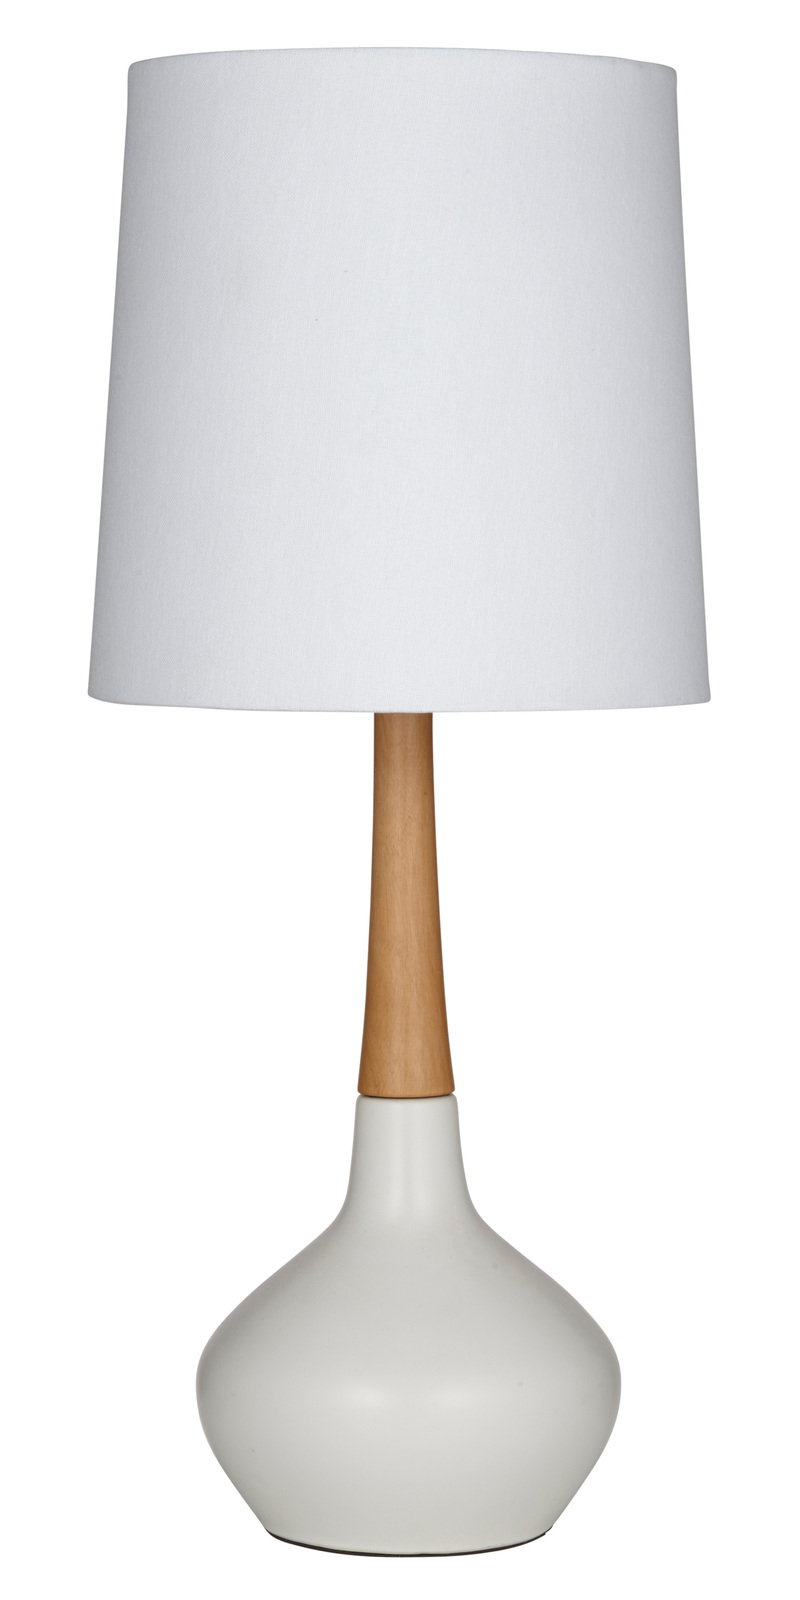 Amalfi: Elke Table Lamp (25x25x59cm) image